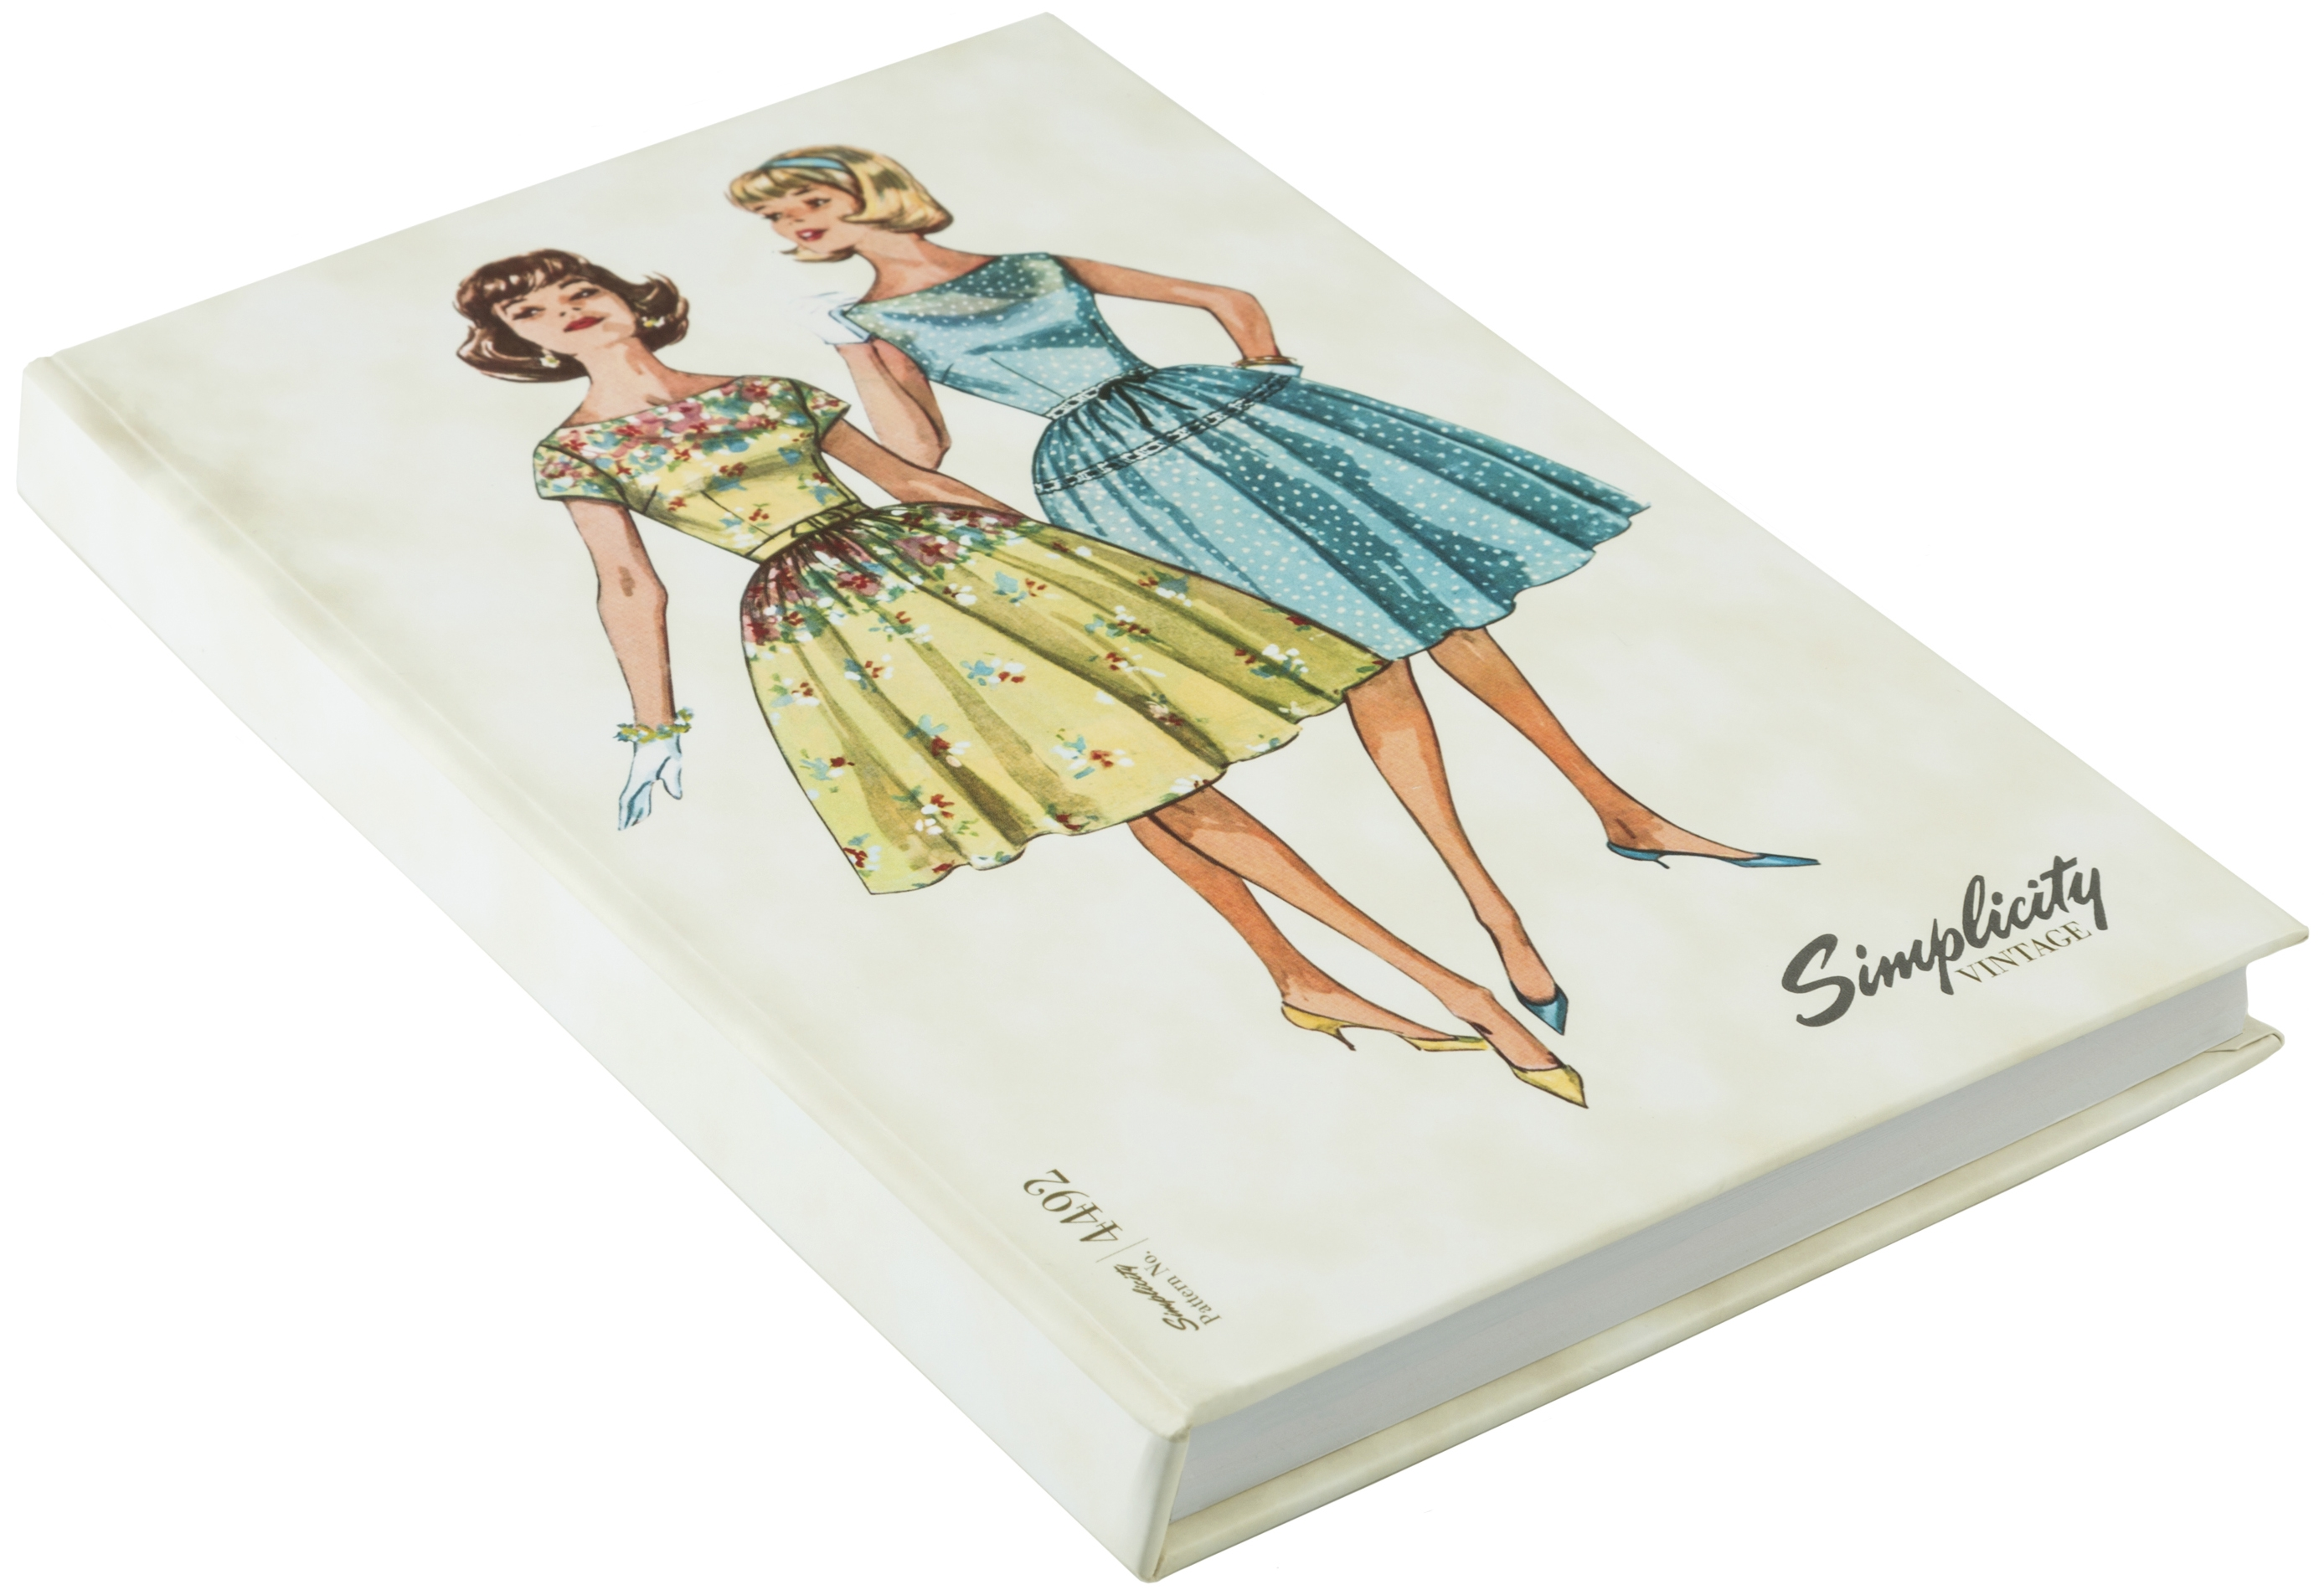 Simplicity Vintage Hardcover Notebook